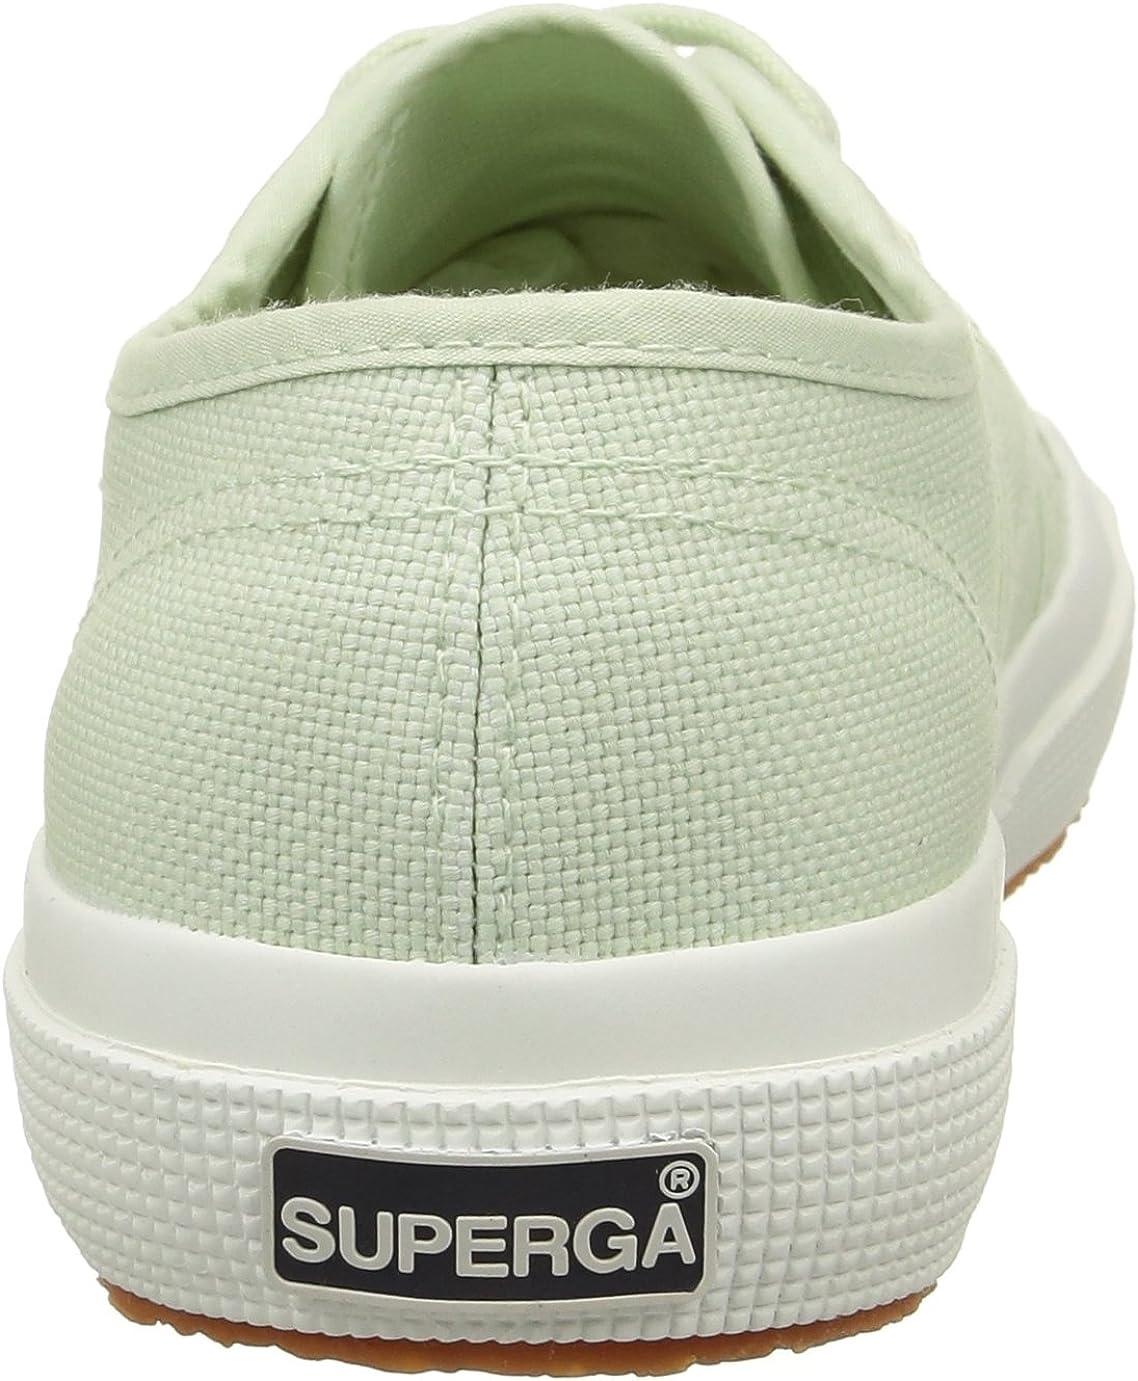 Superga 2750 COTU Classic, Zapatillas para Mujer Green 936 NSC6Q